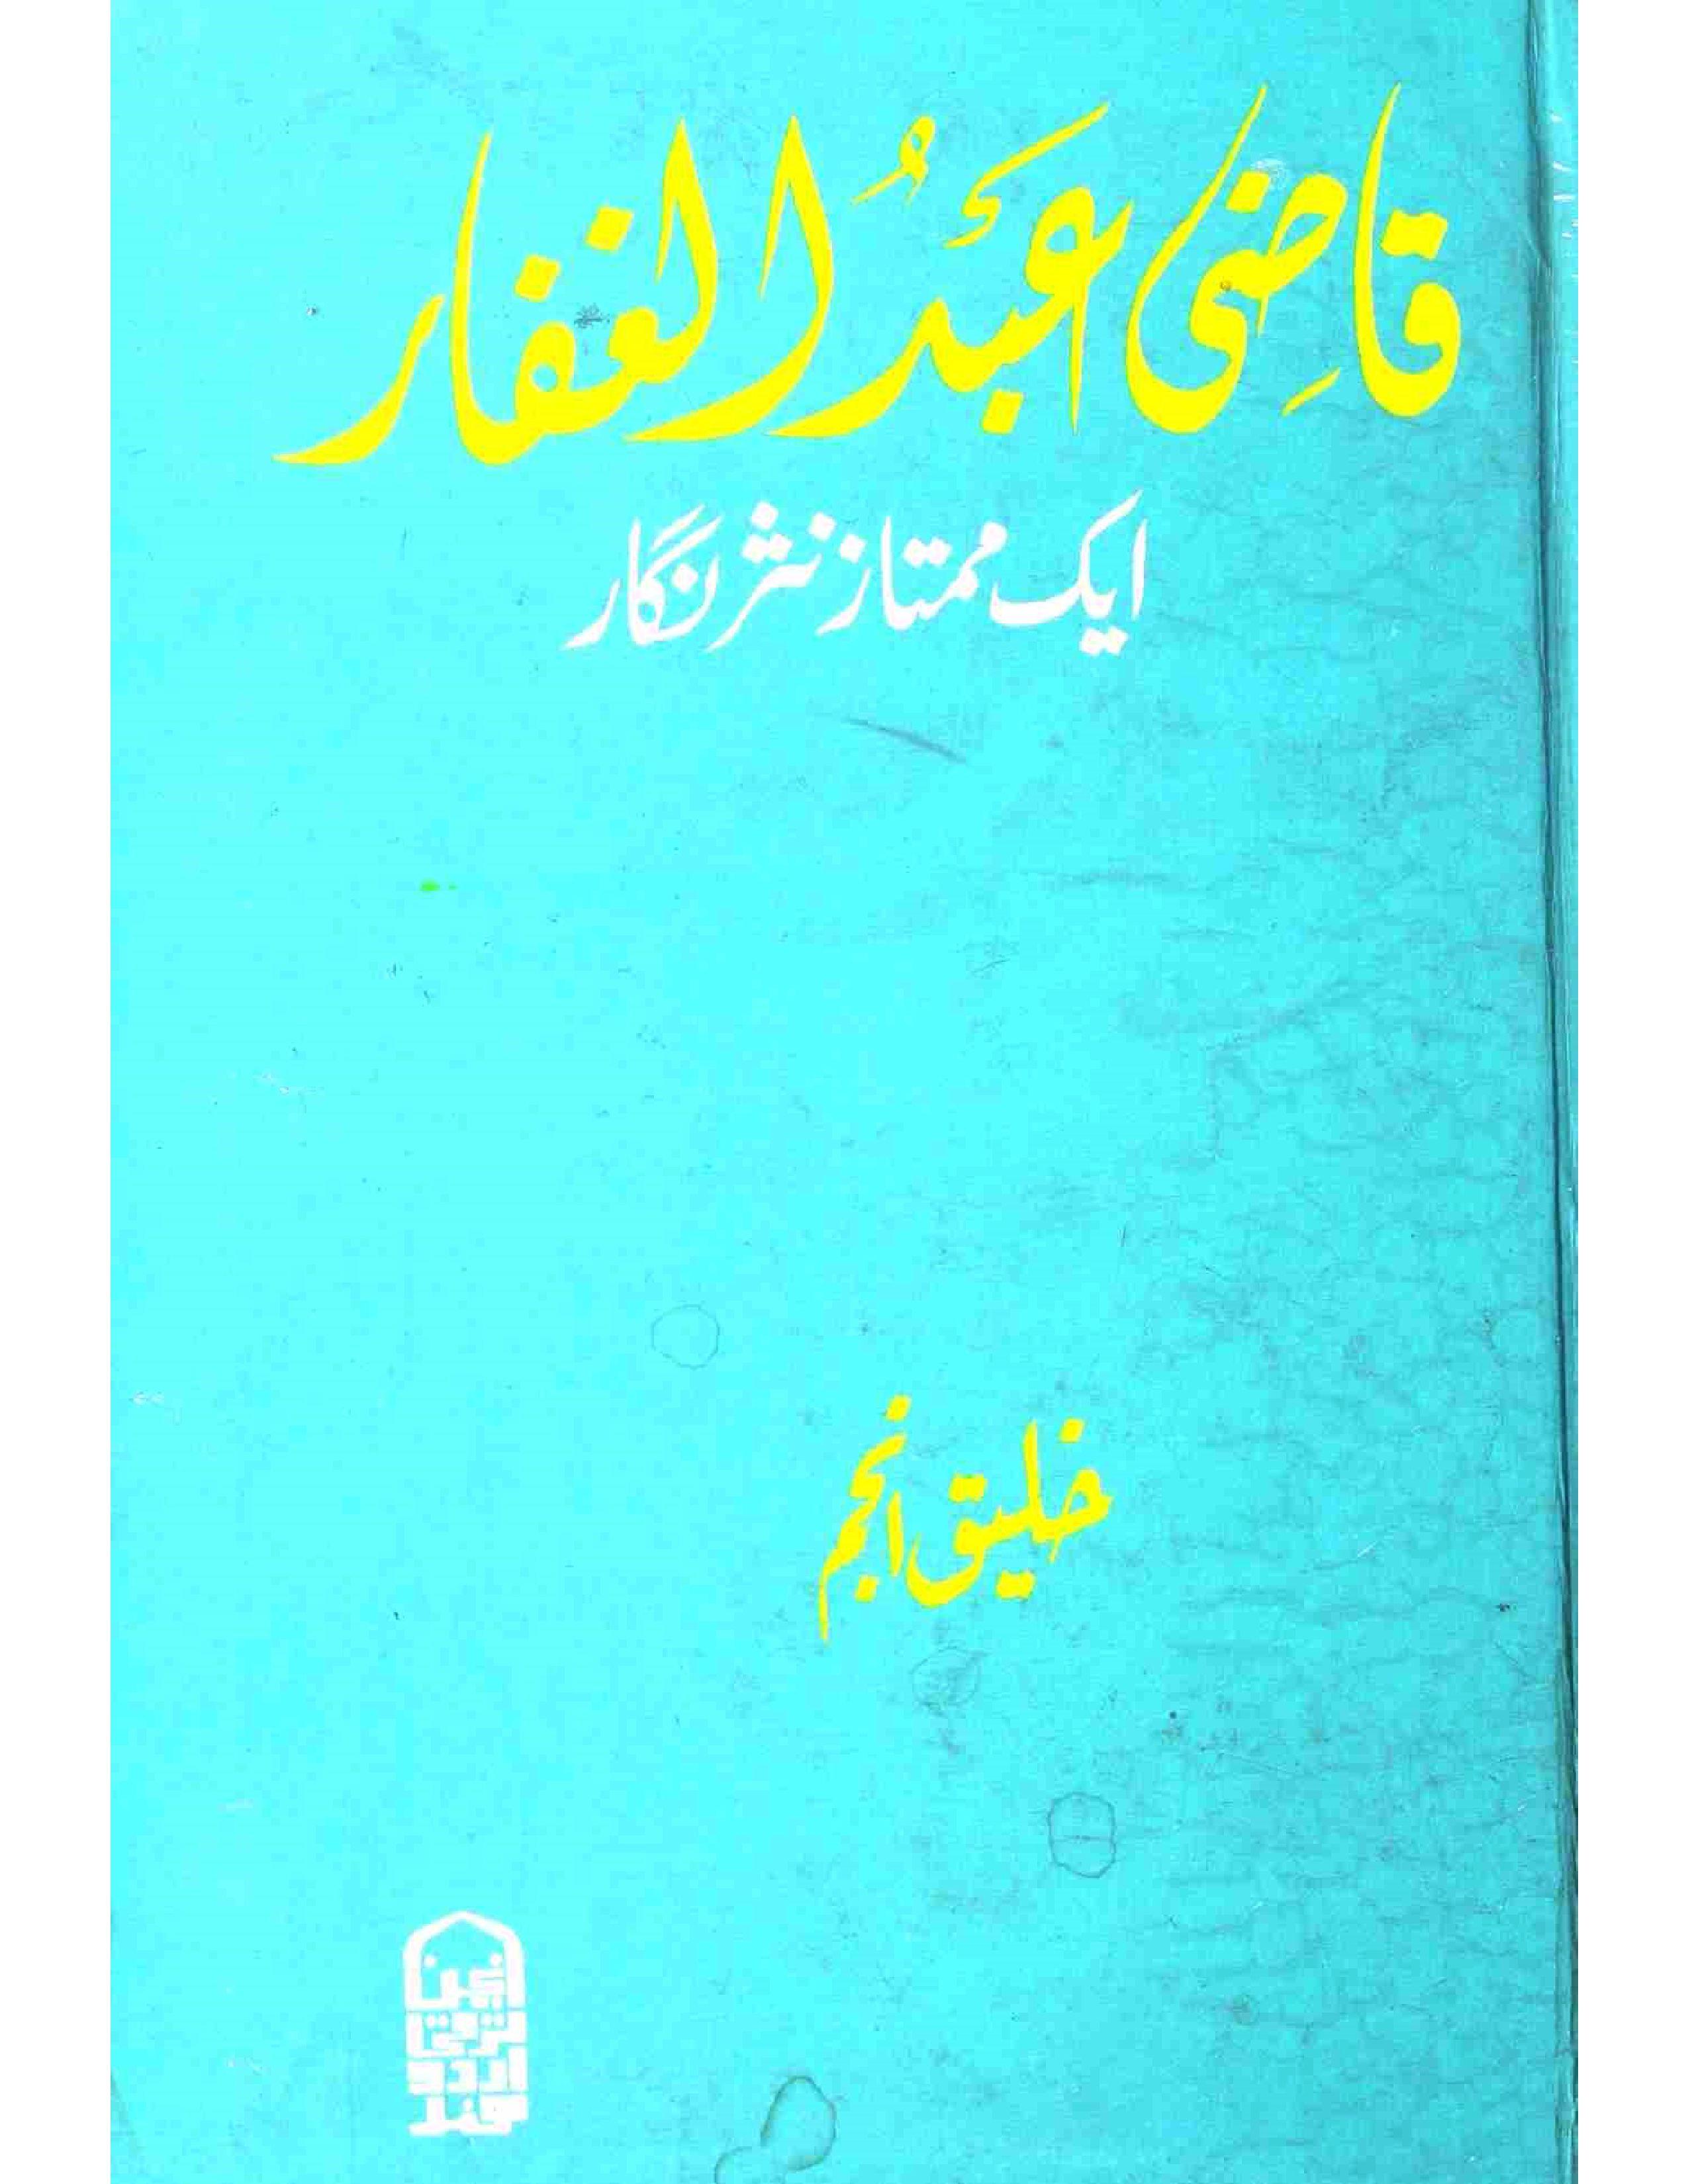 Qazi Abdul Ghaffar : Ek Mumtaz Nasr Nigar